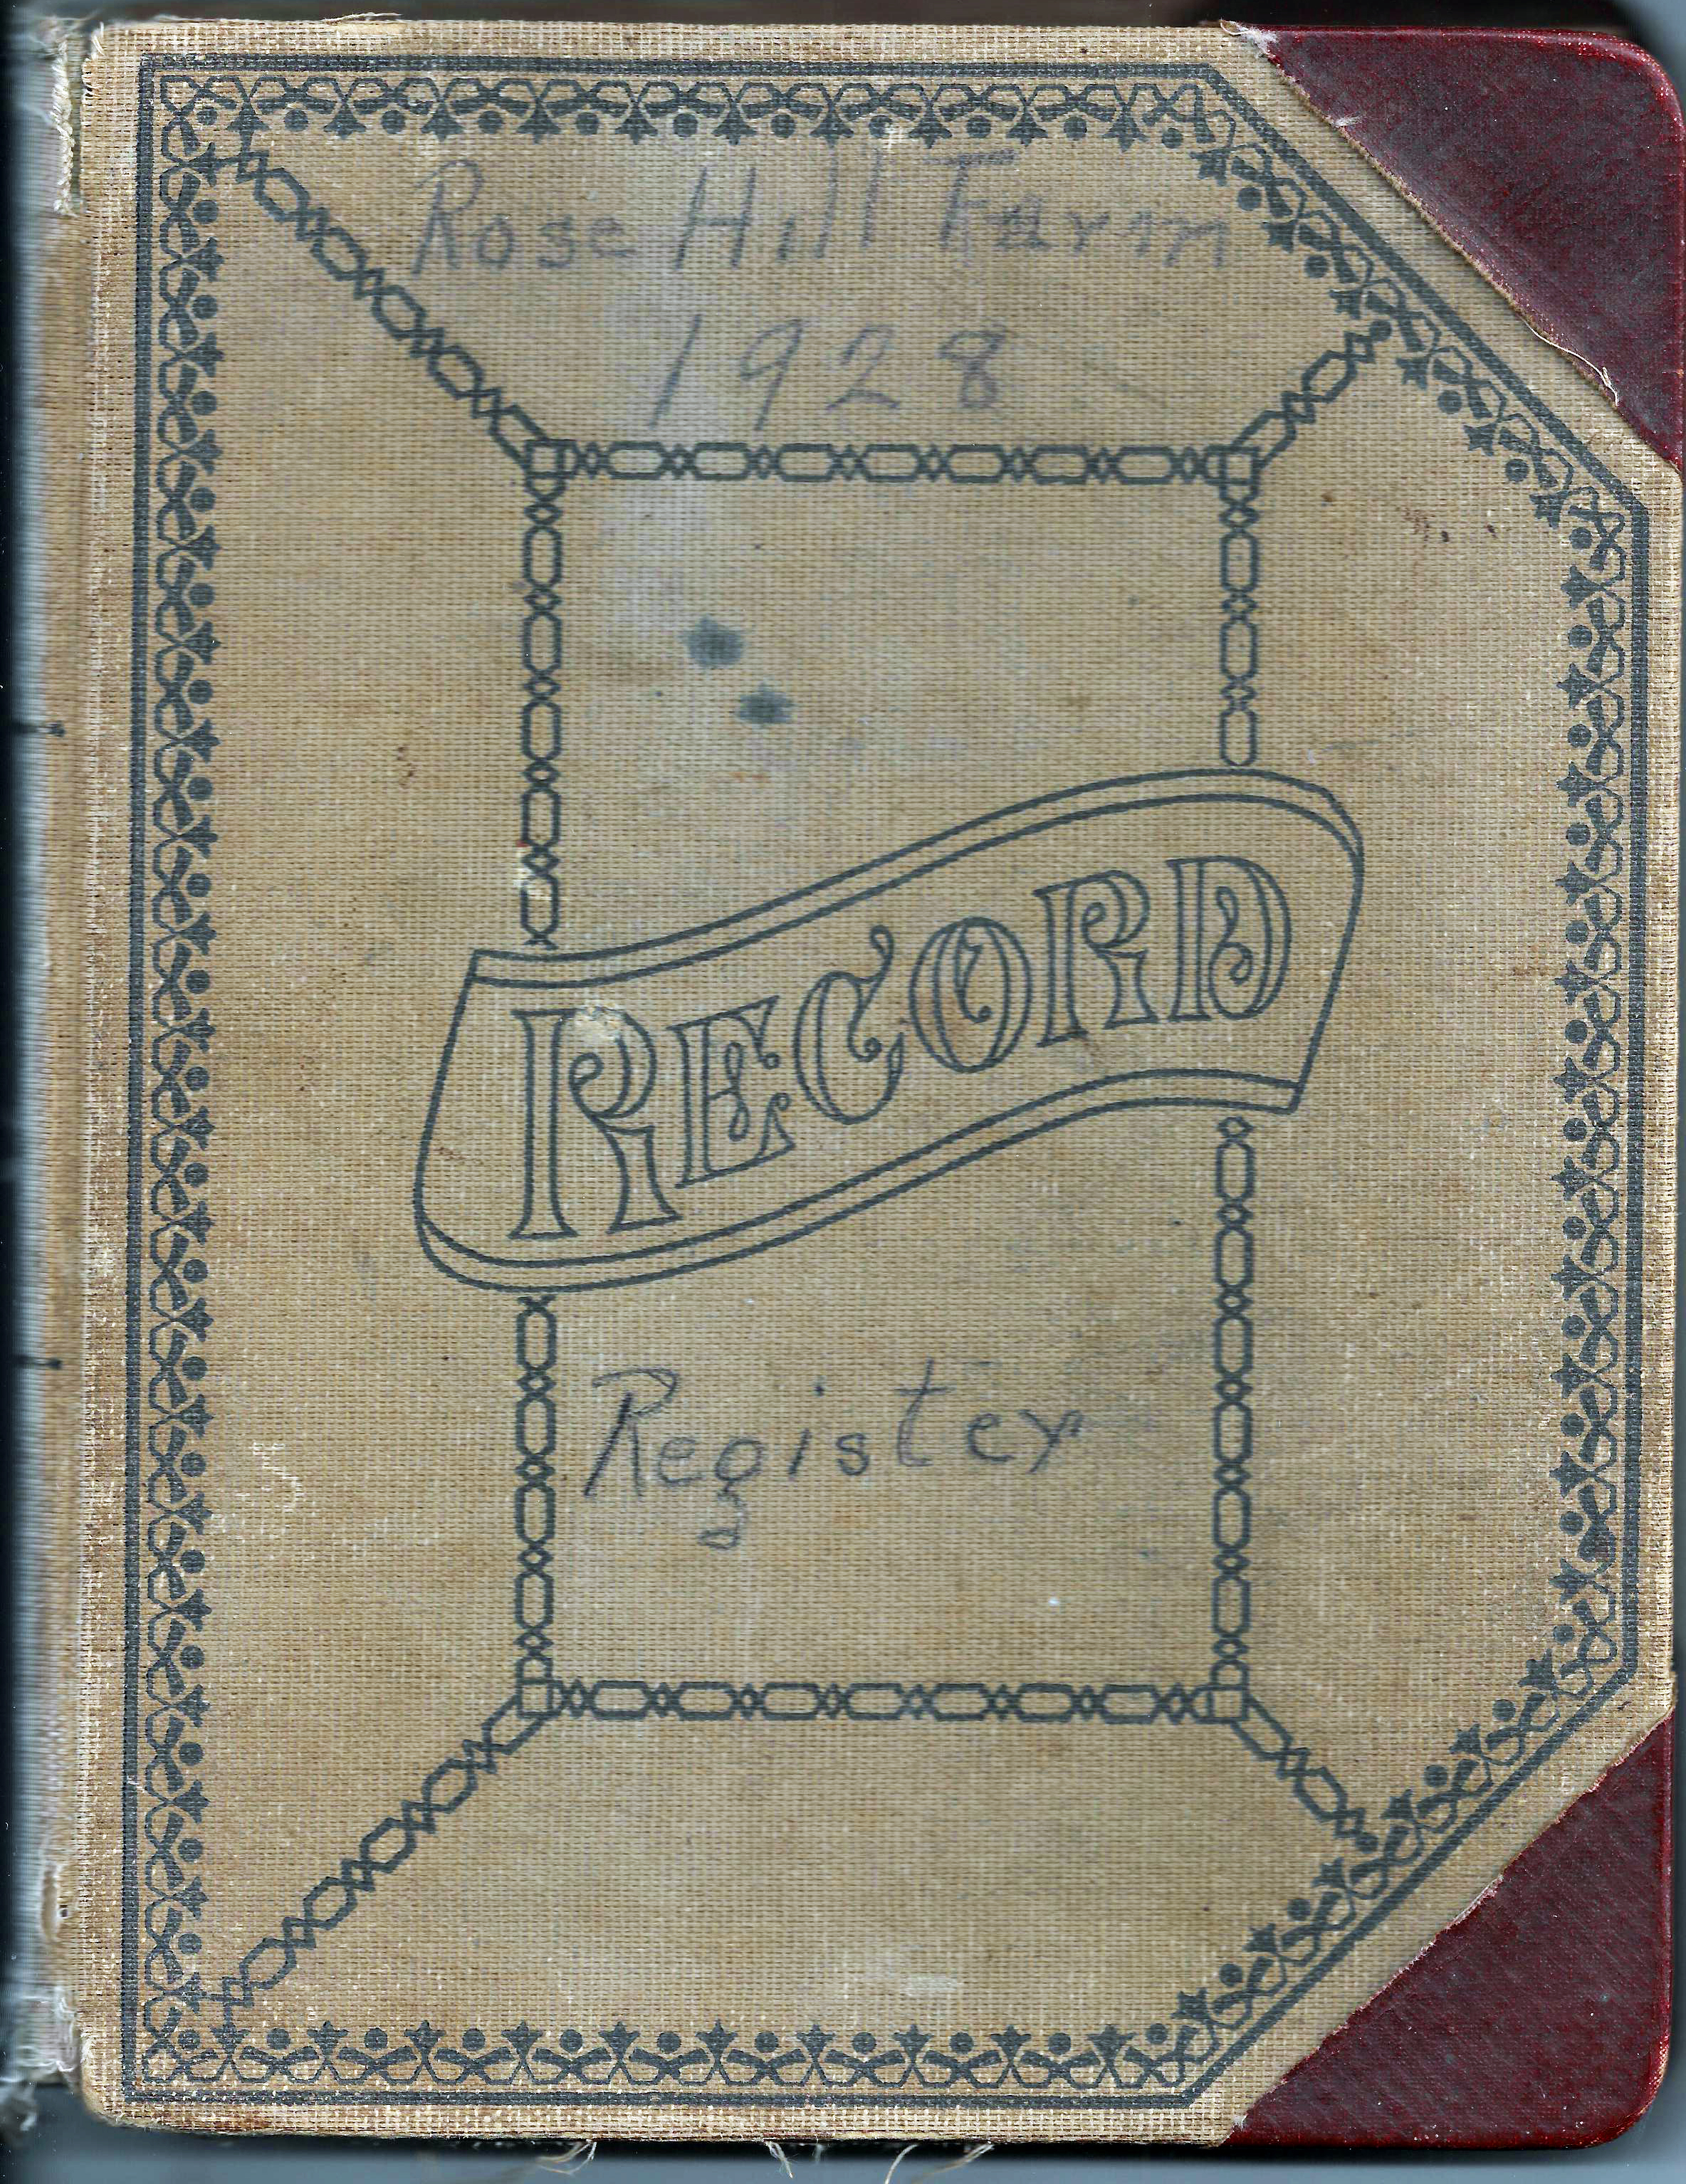 Rose Hill Farm Guest Register 1928